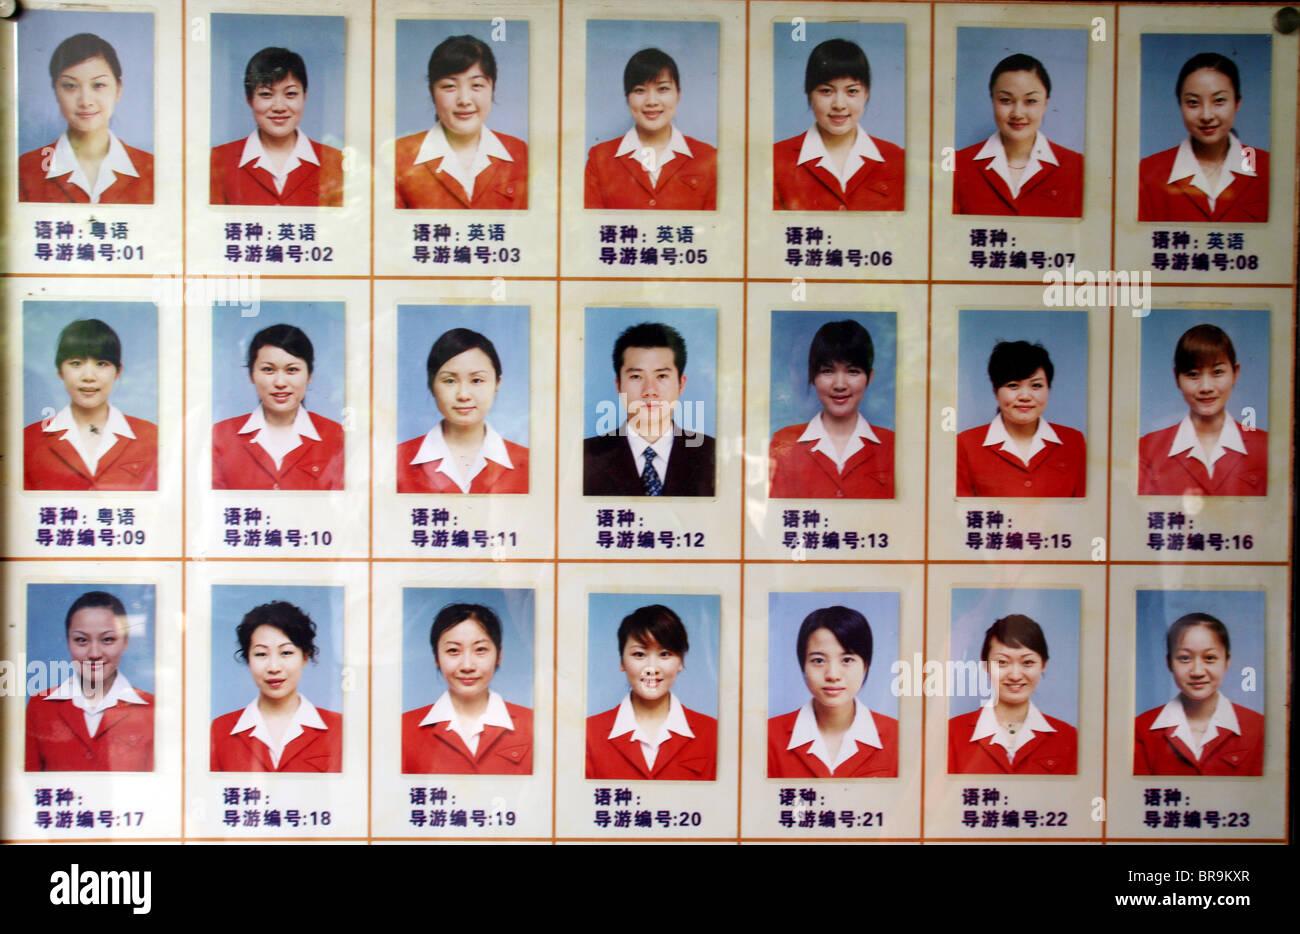 Chinese employees - Stock Image